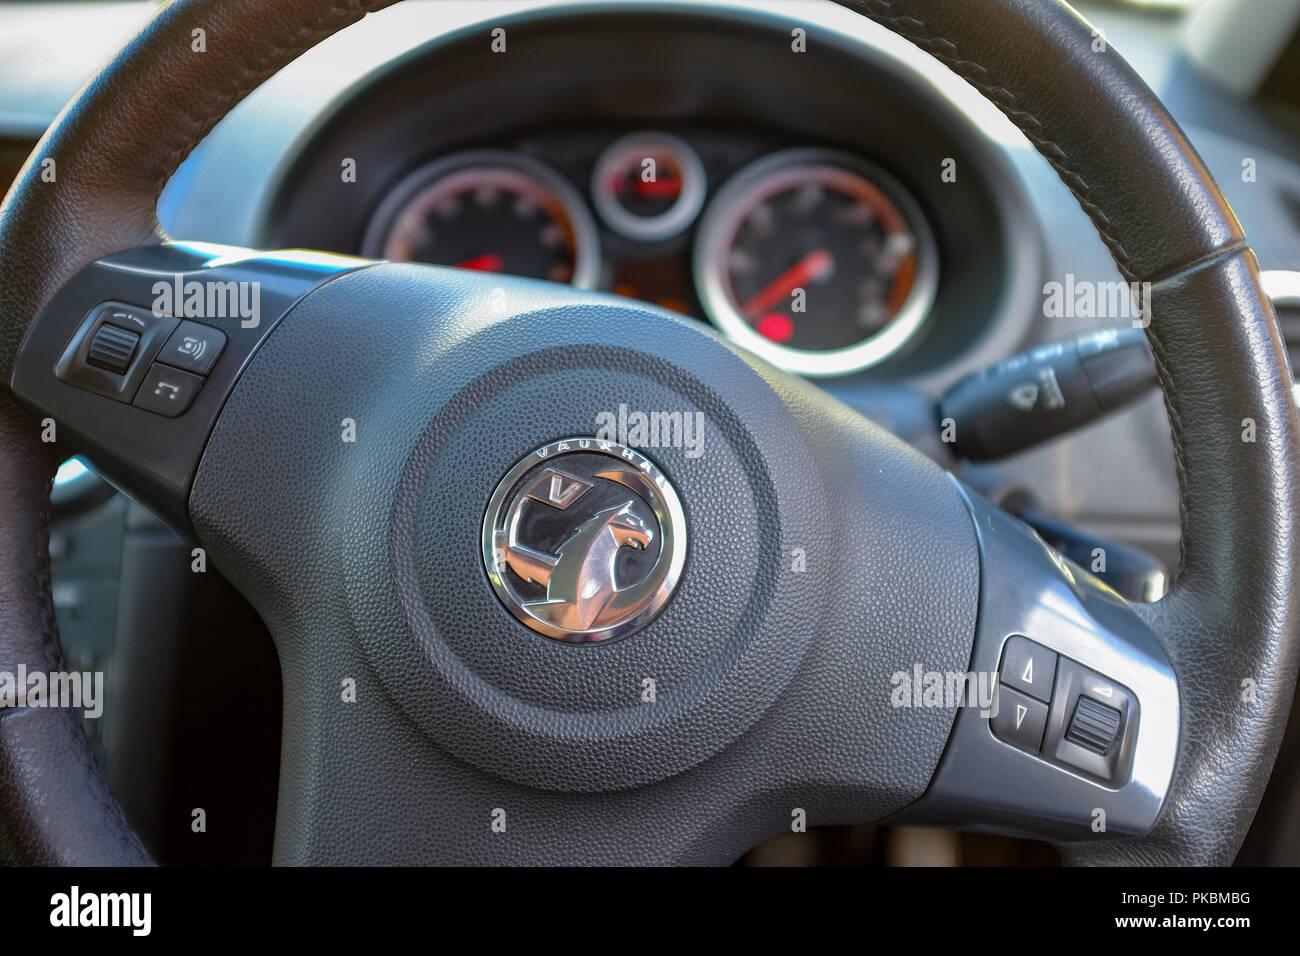 Vauxhall Corsa volante Imagen De Stock